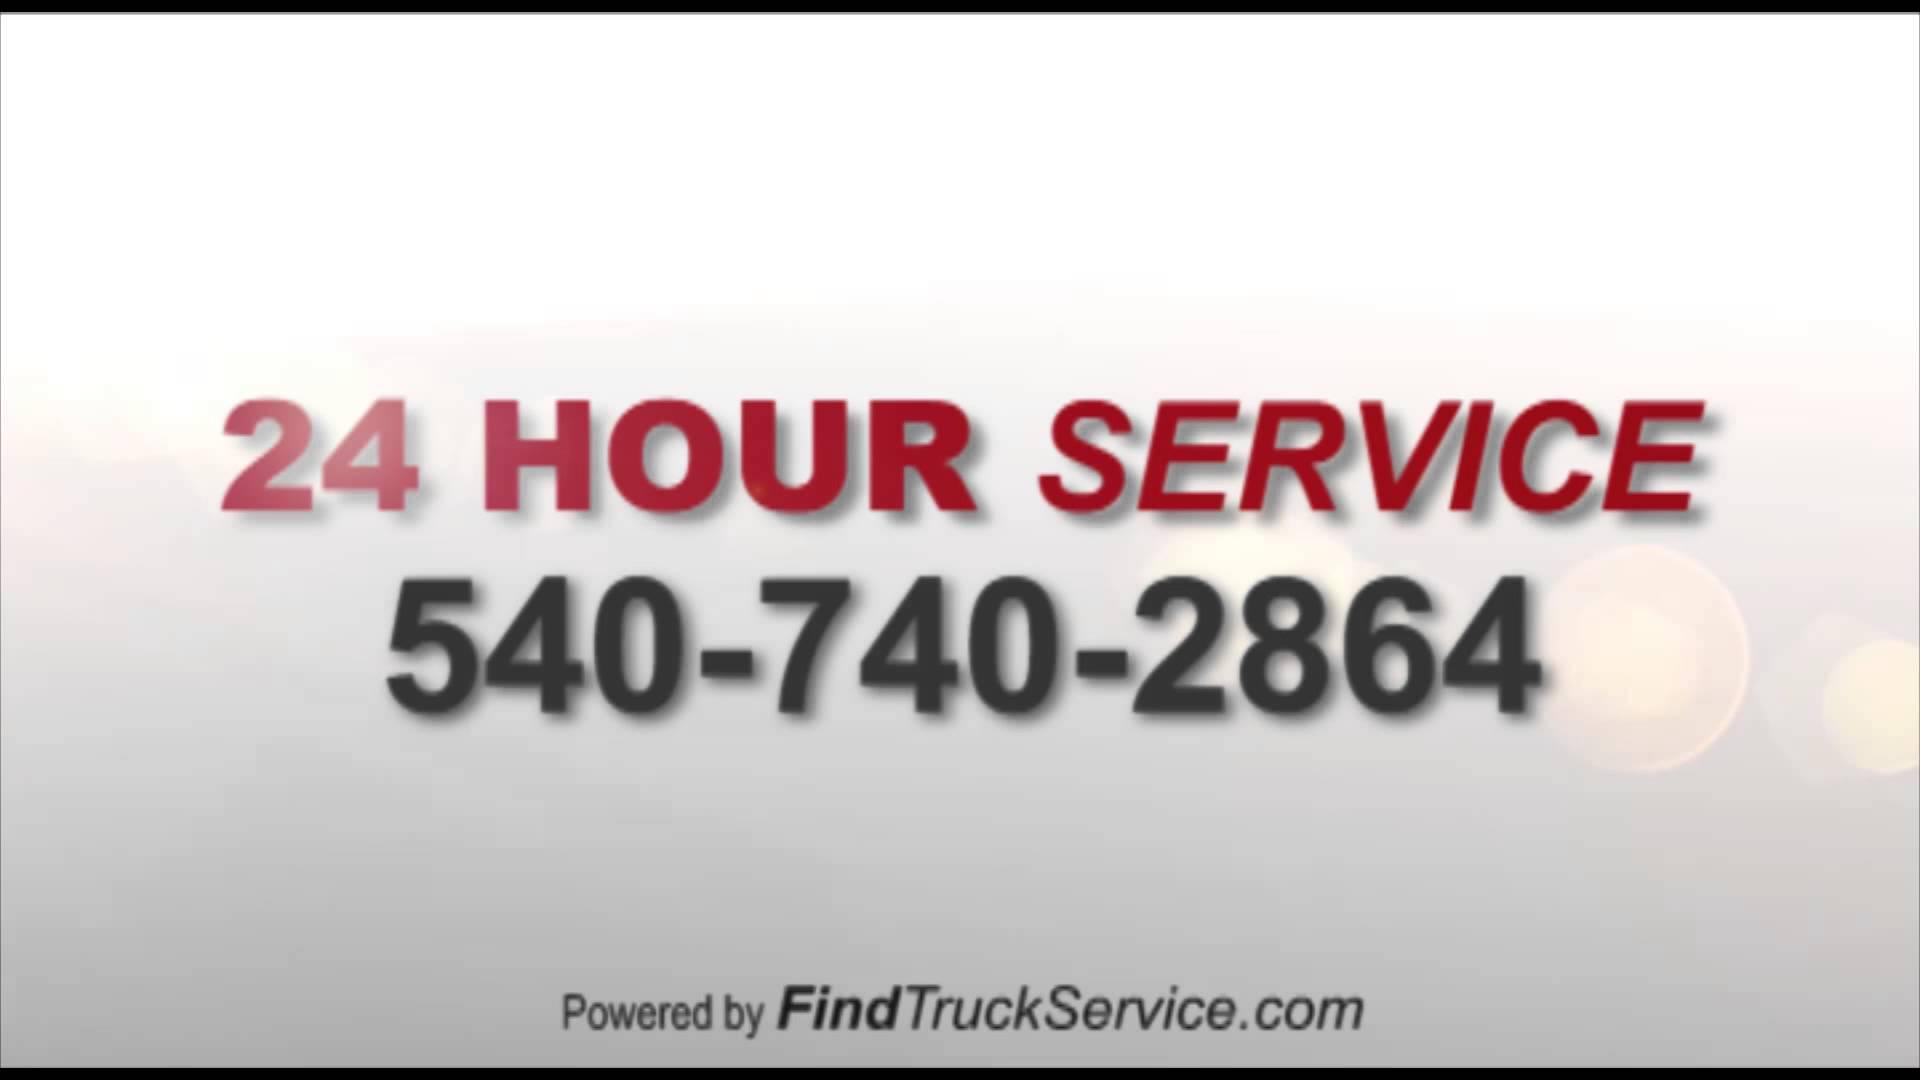 Steve's Truck & Tire Repair in New Market, VA | 24 Hour Find Truck Service